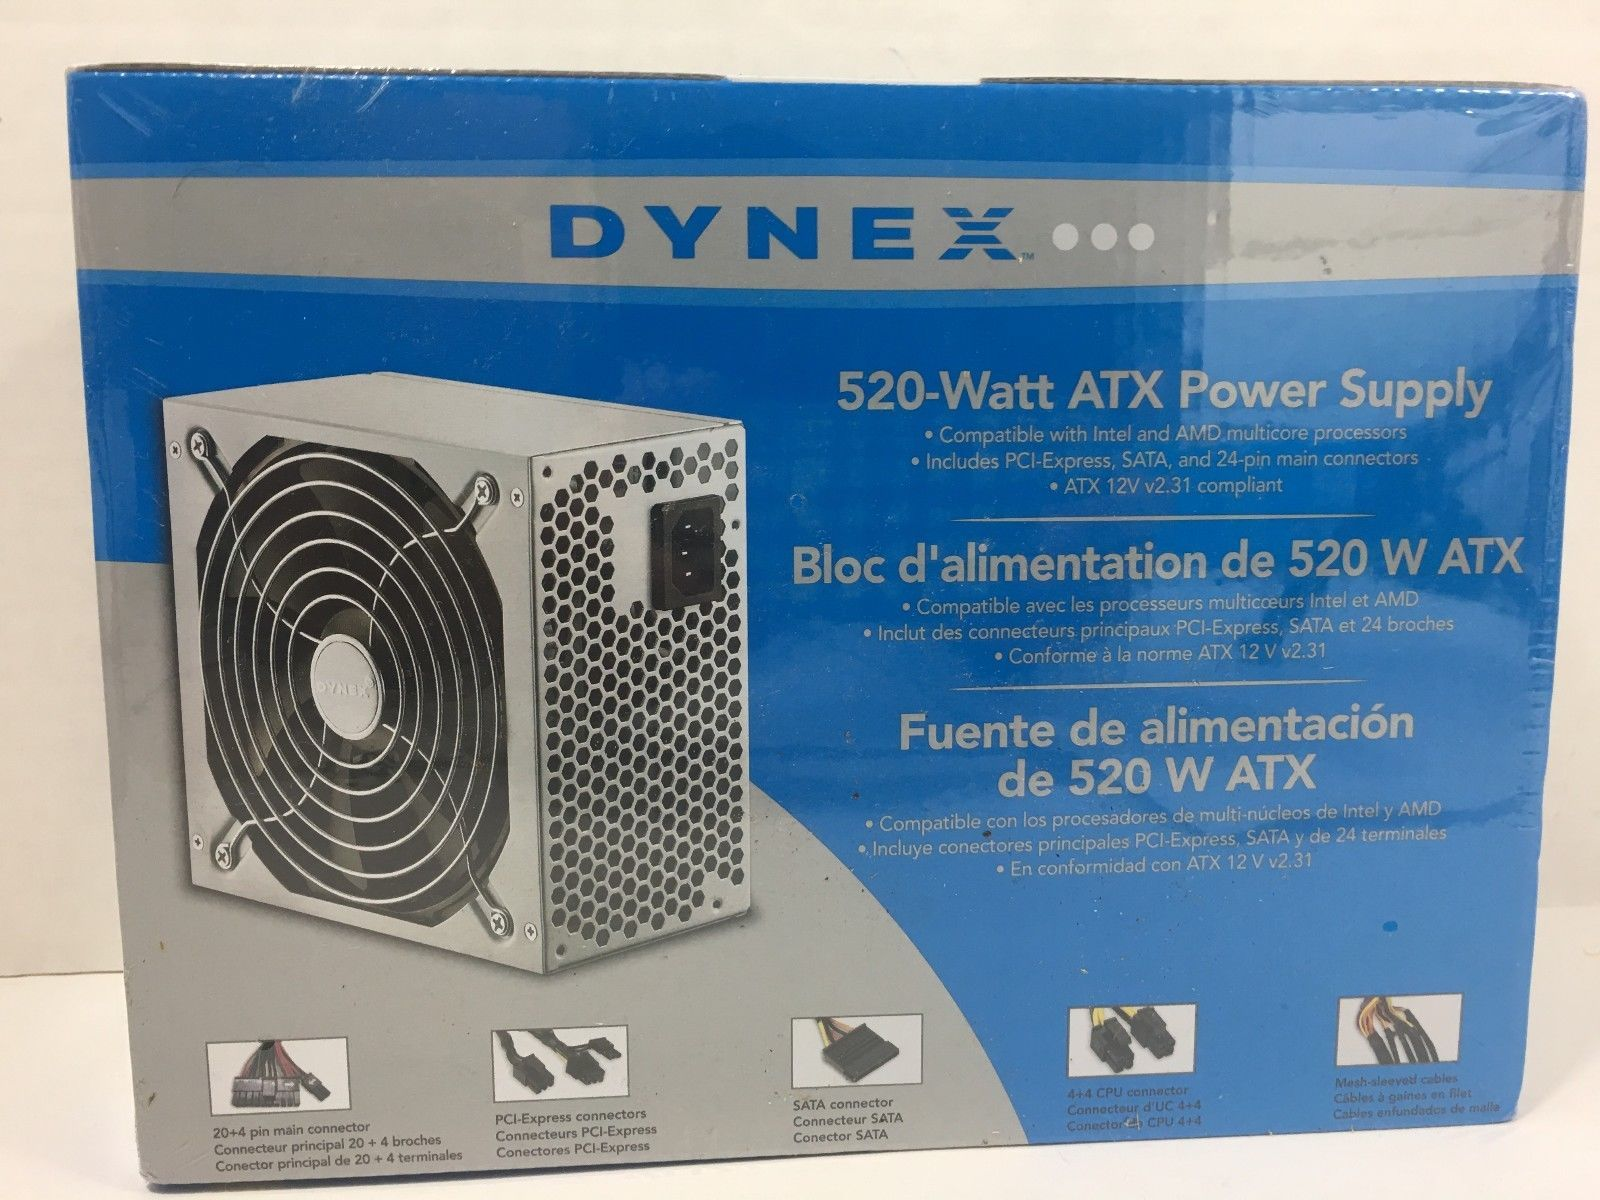 Dynex 520 Watt Atx Power Supply